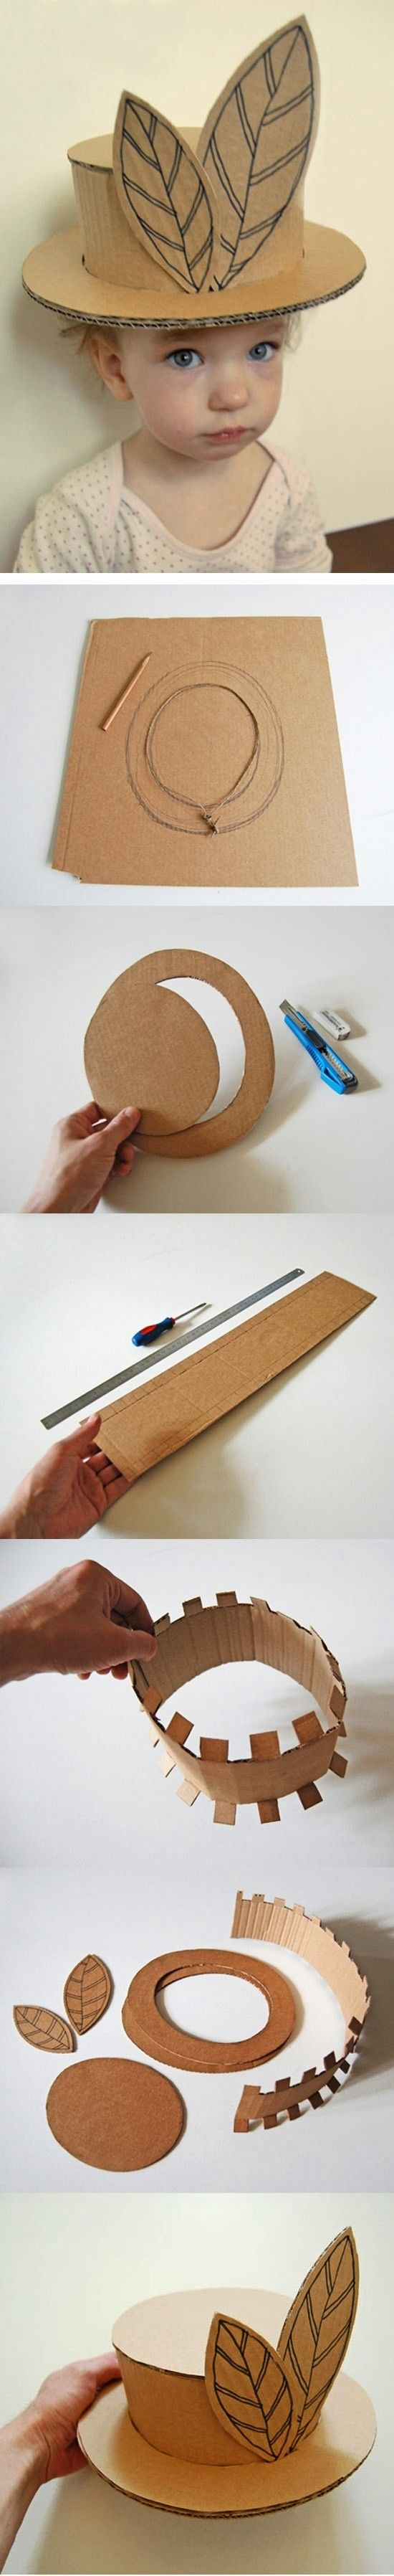 DIY : Kids Cardboard Hat Project